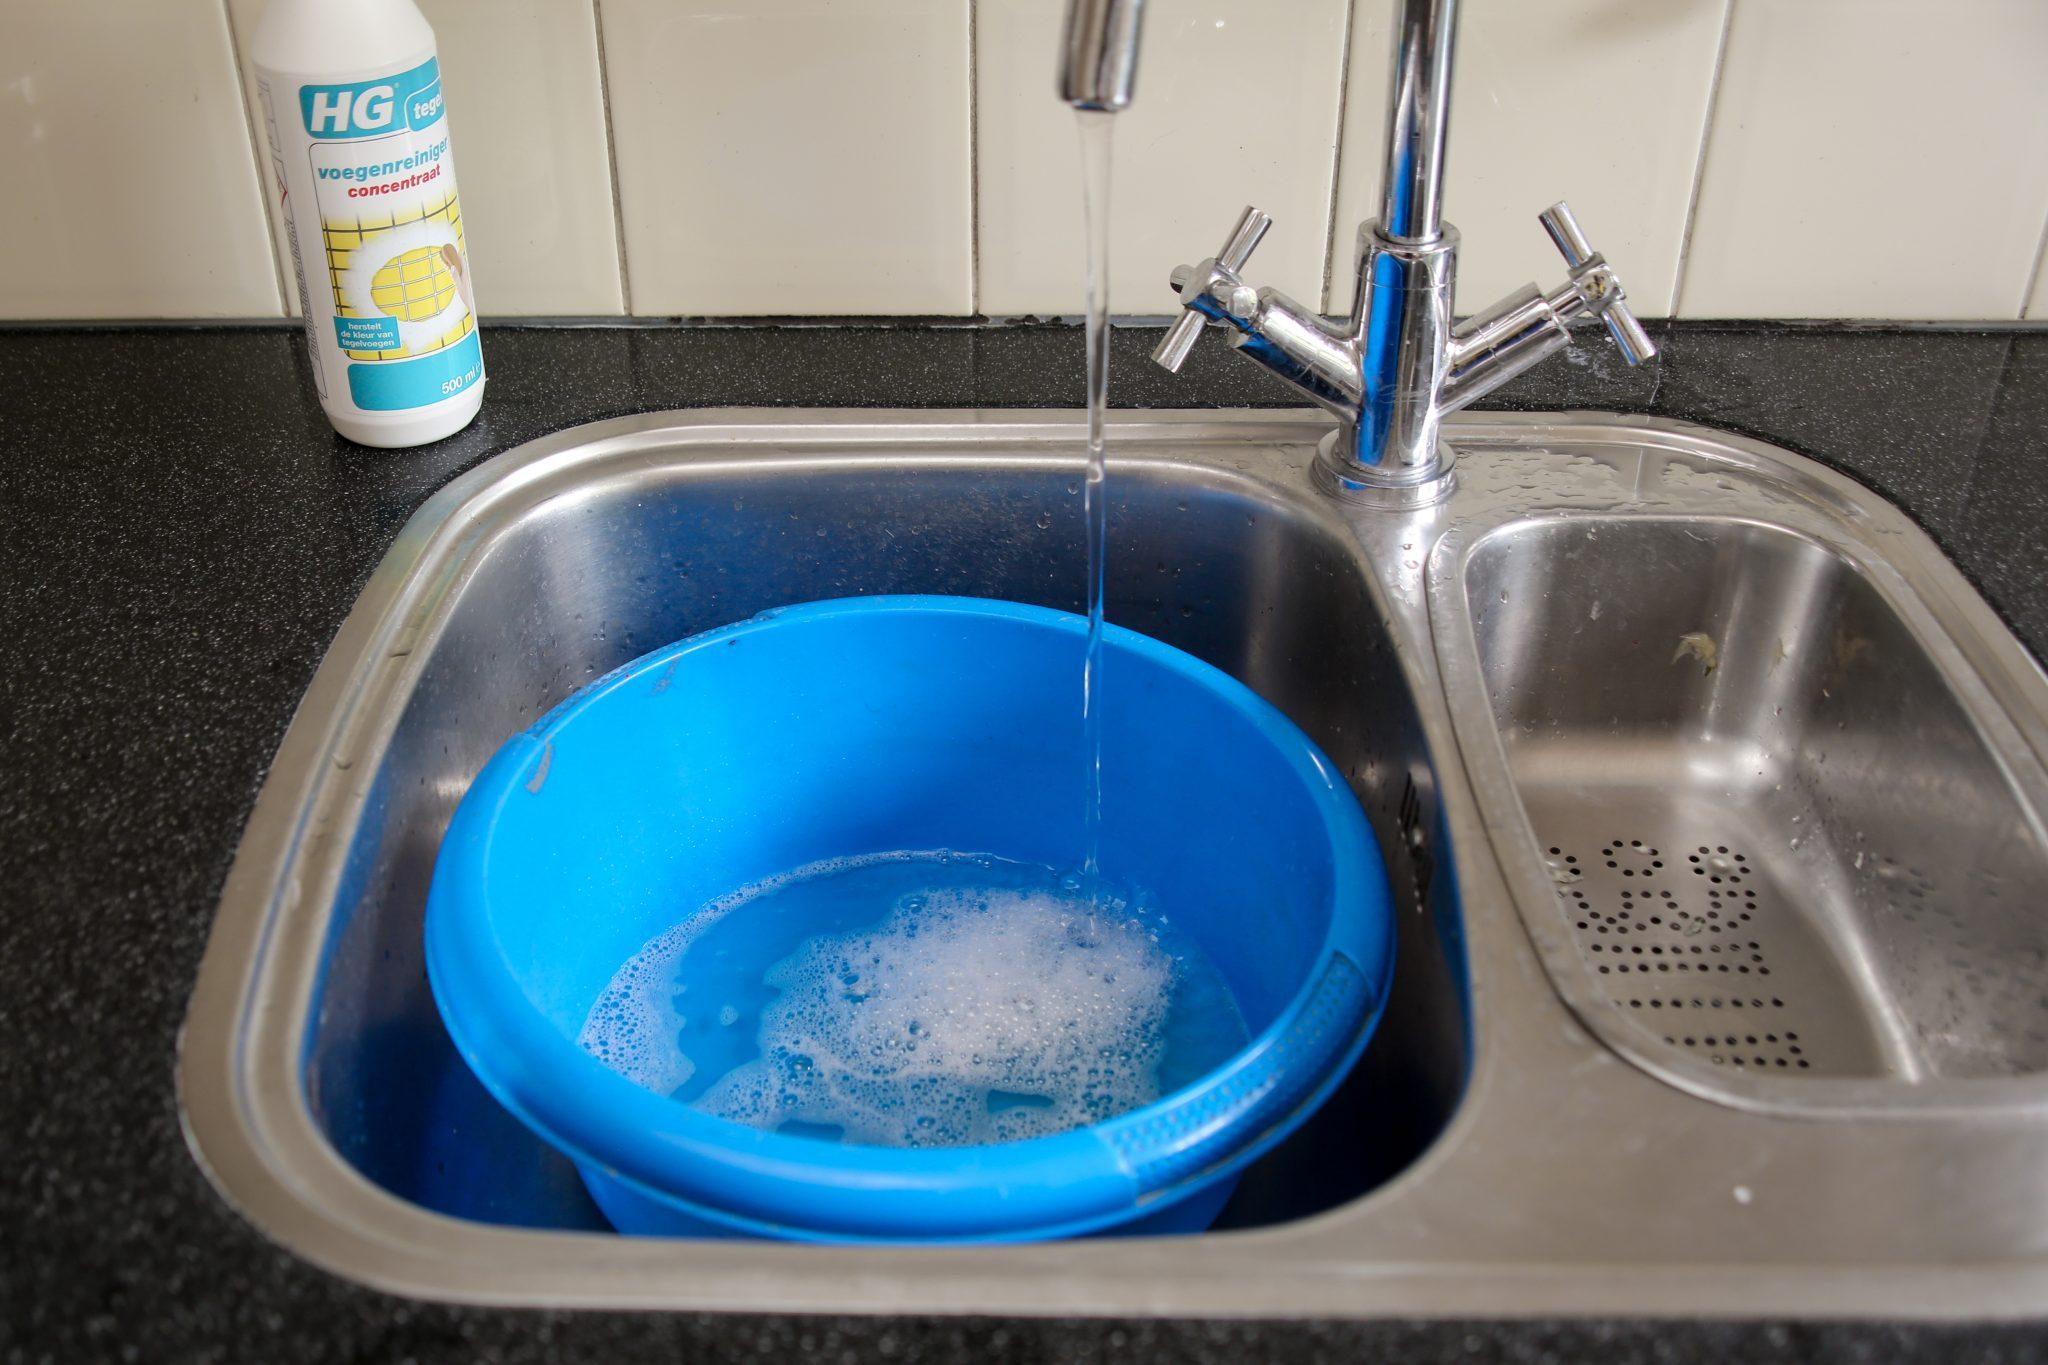 HG voegen reiniger sopje